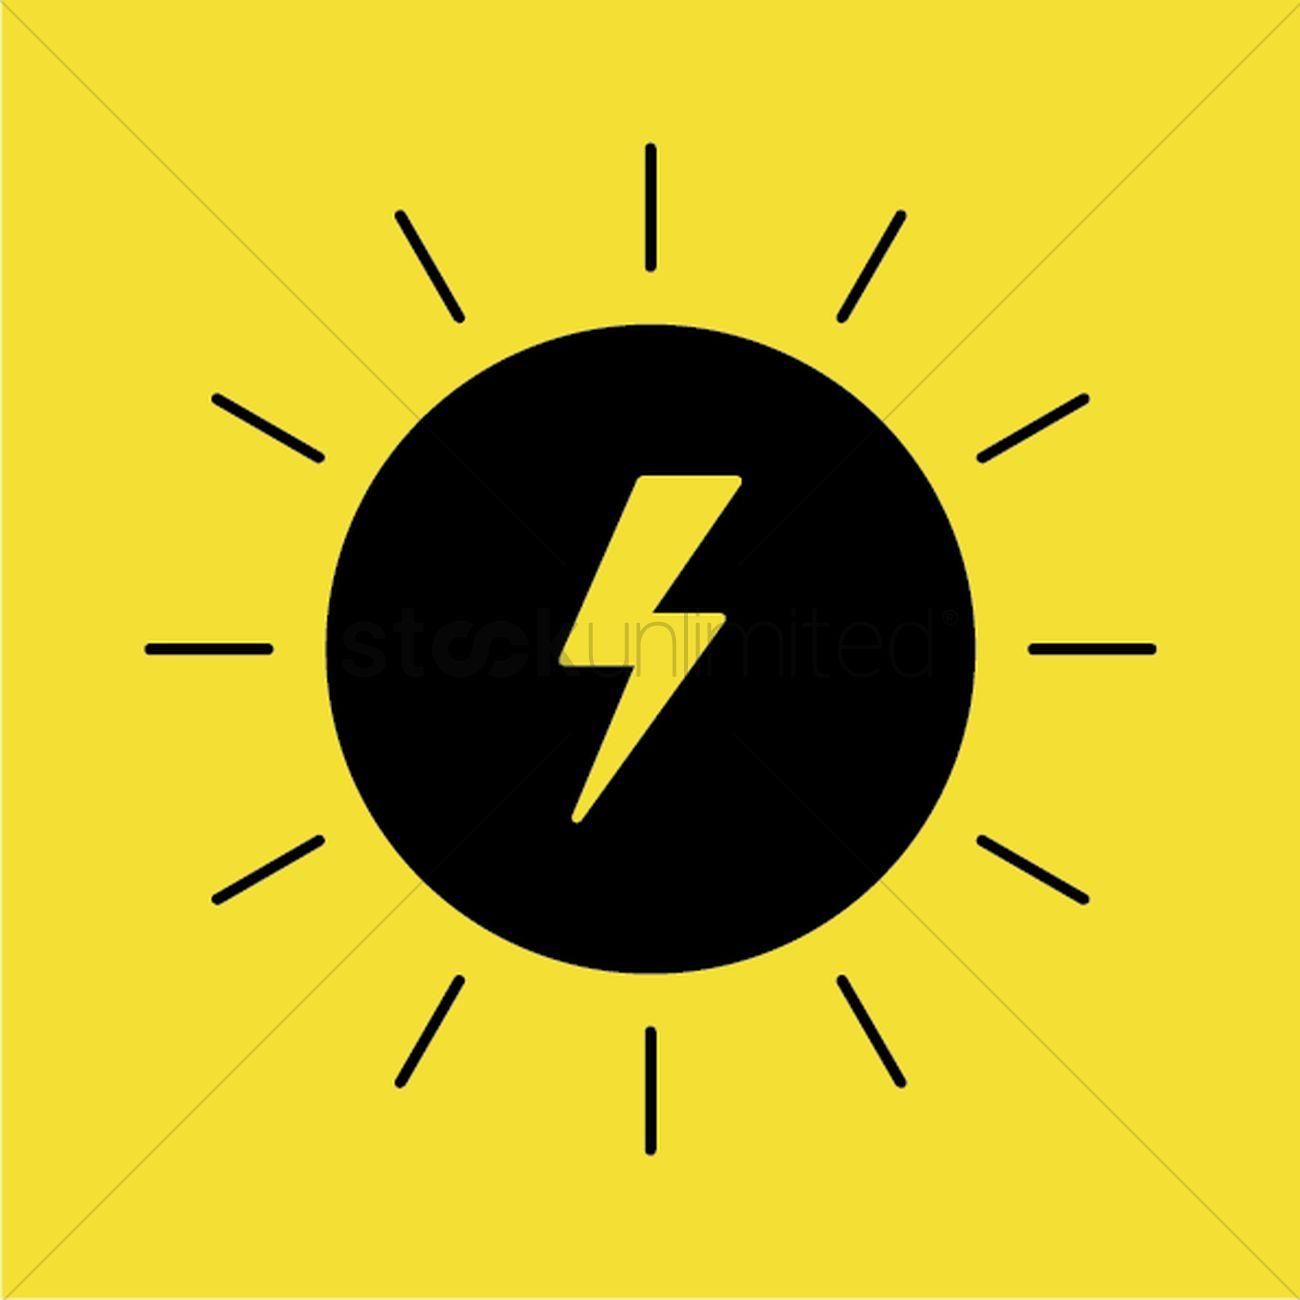 Solar Energy Generator Vector Image 2033441 Stockunlimited